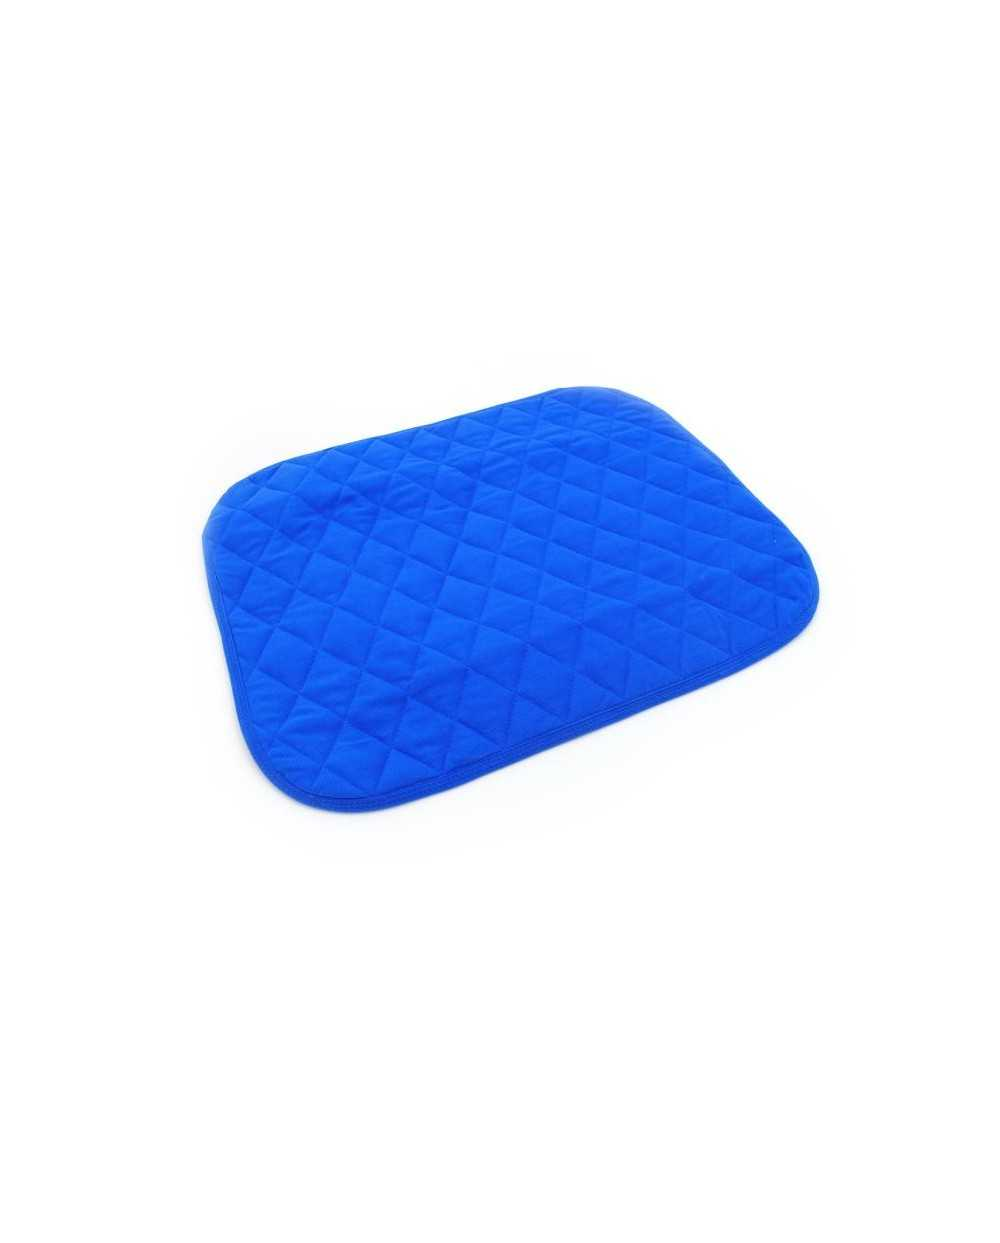 Alèse de siège matelassée, 40 x 50 cm, bleu.